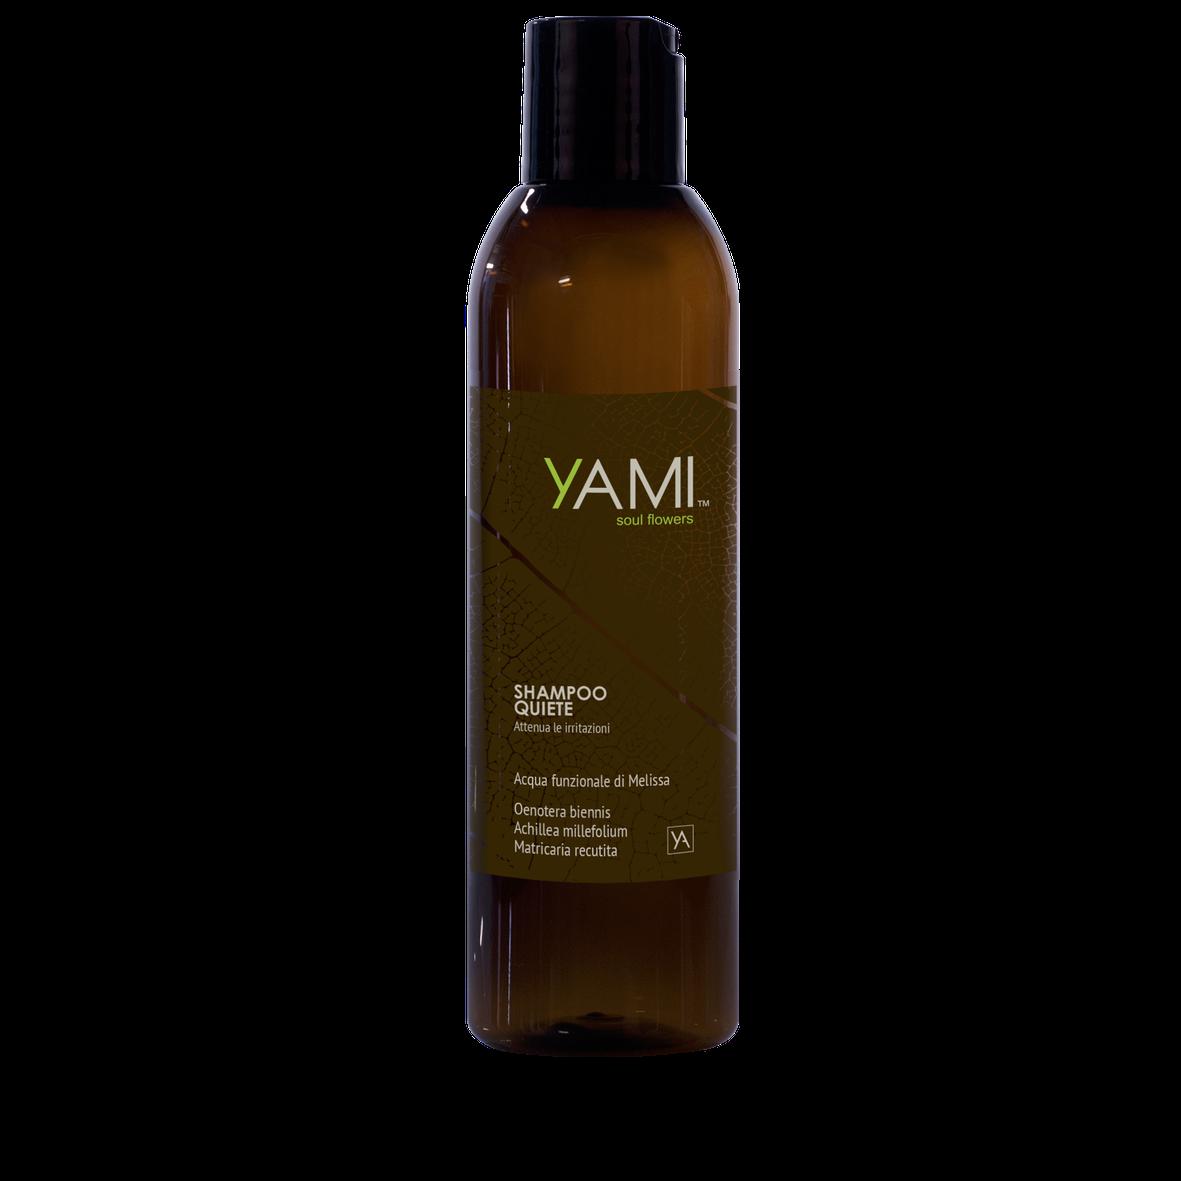 shampoo Quiete